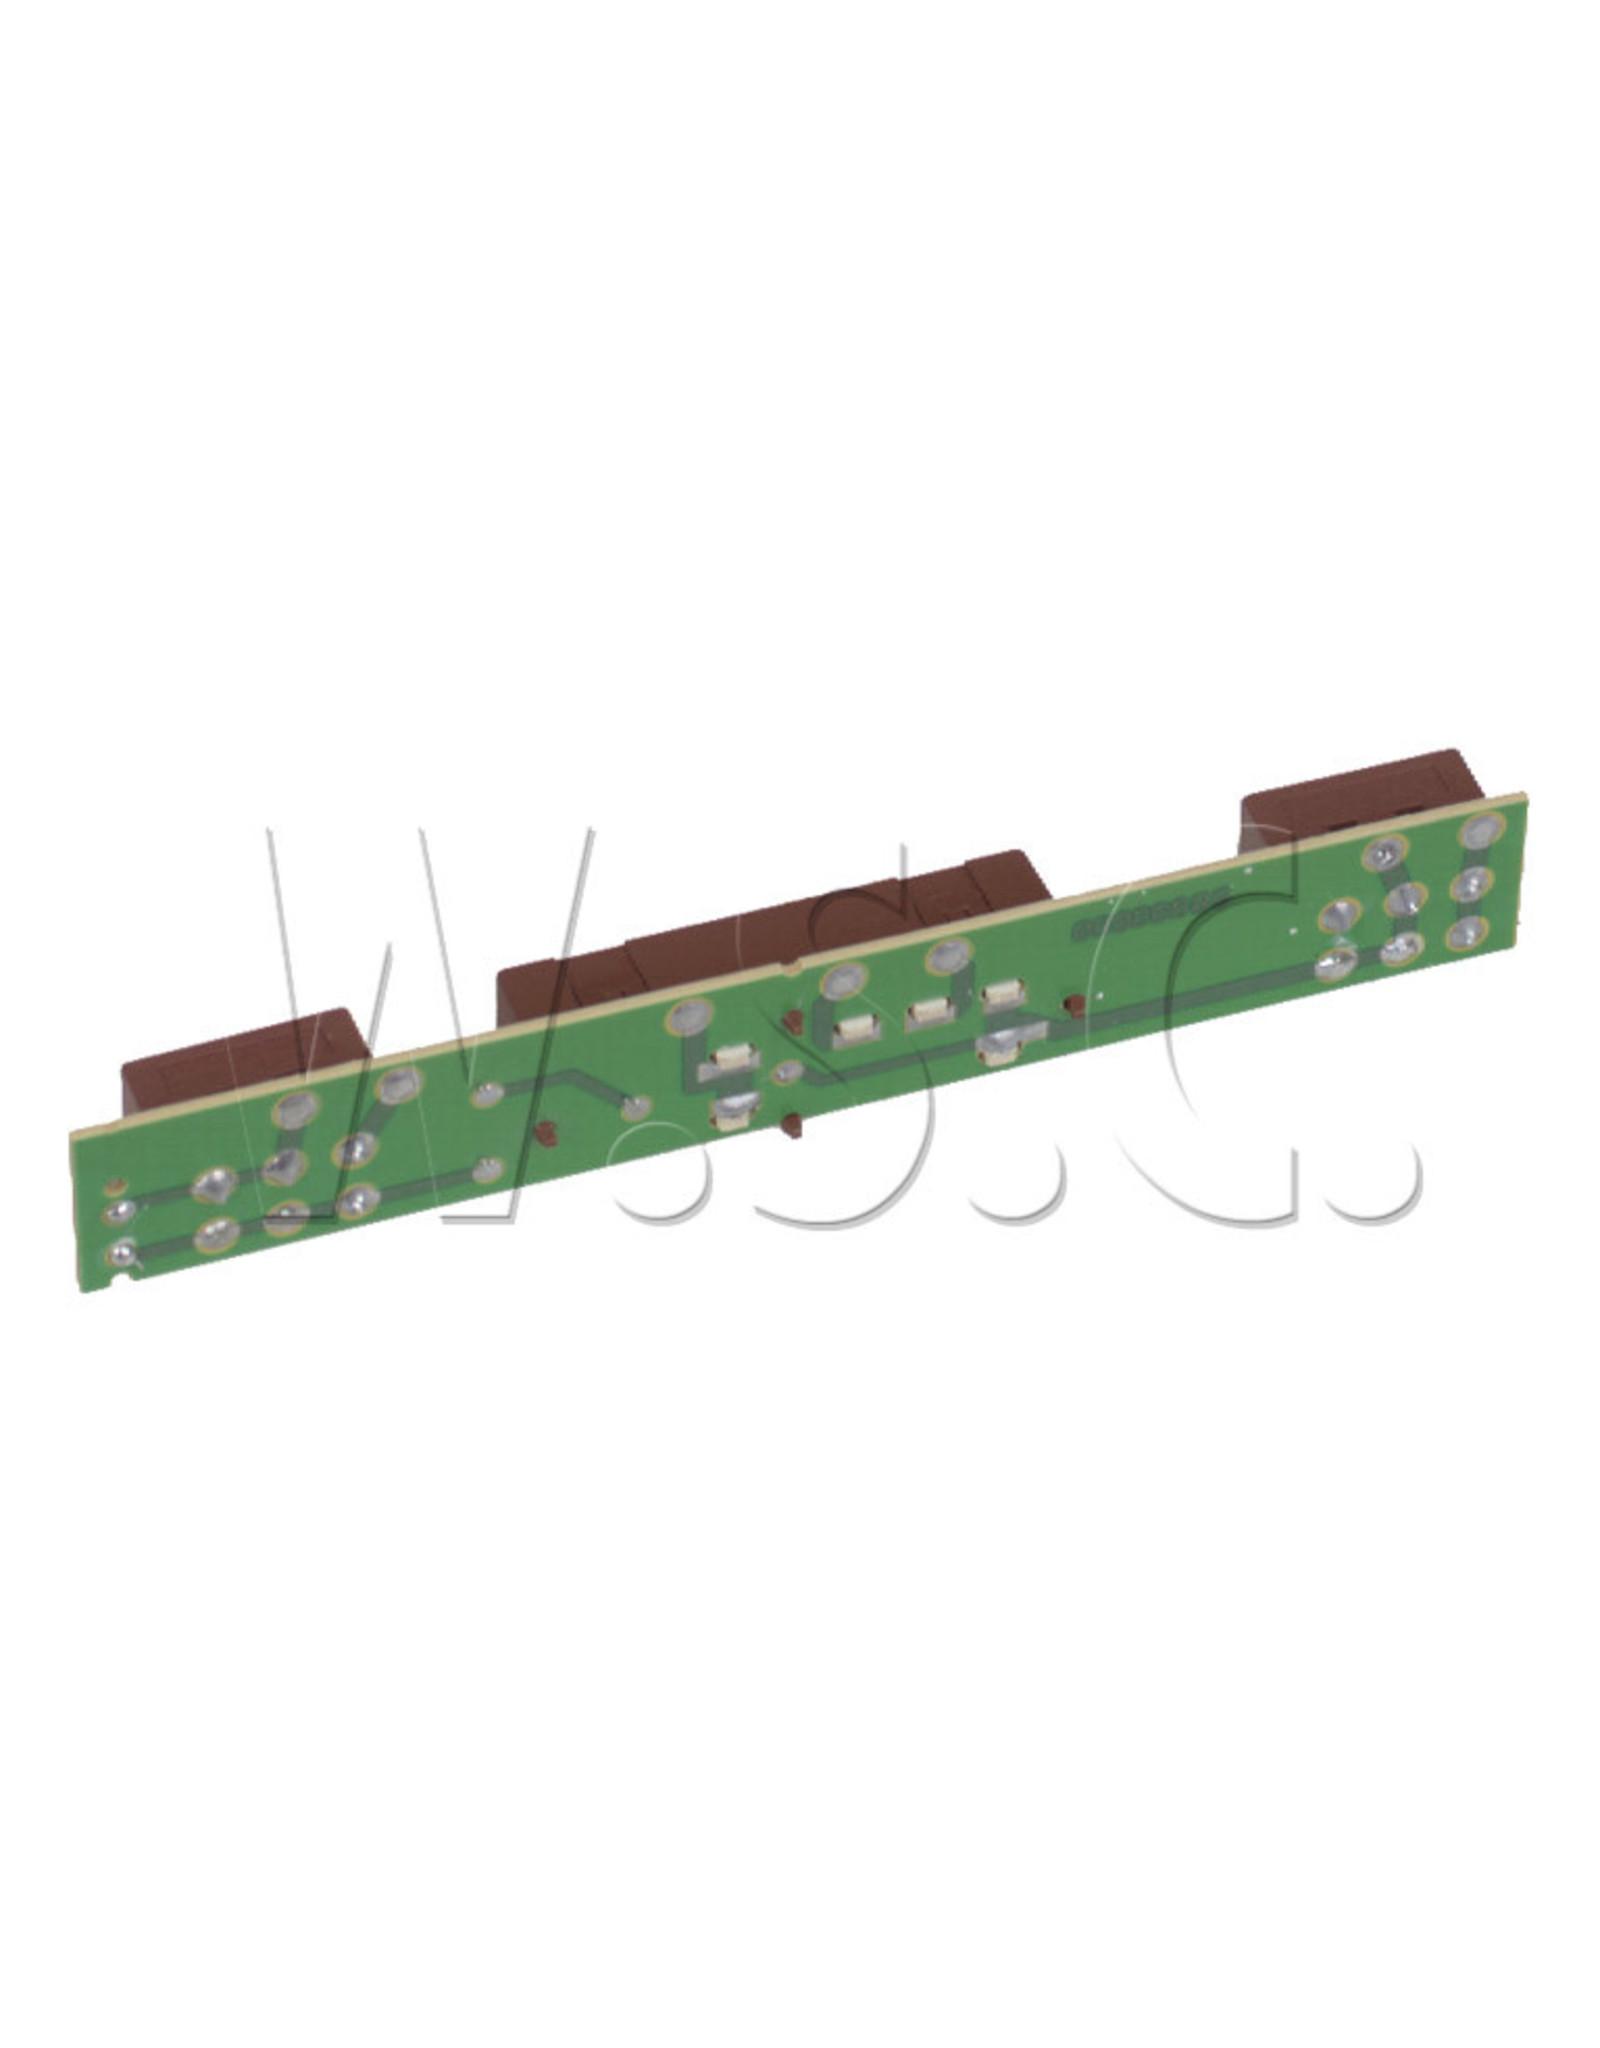 Scholtes MODULE - STUURKAART  K4  /  K43L  / IS43L/ IS8L/ MEURILUX